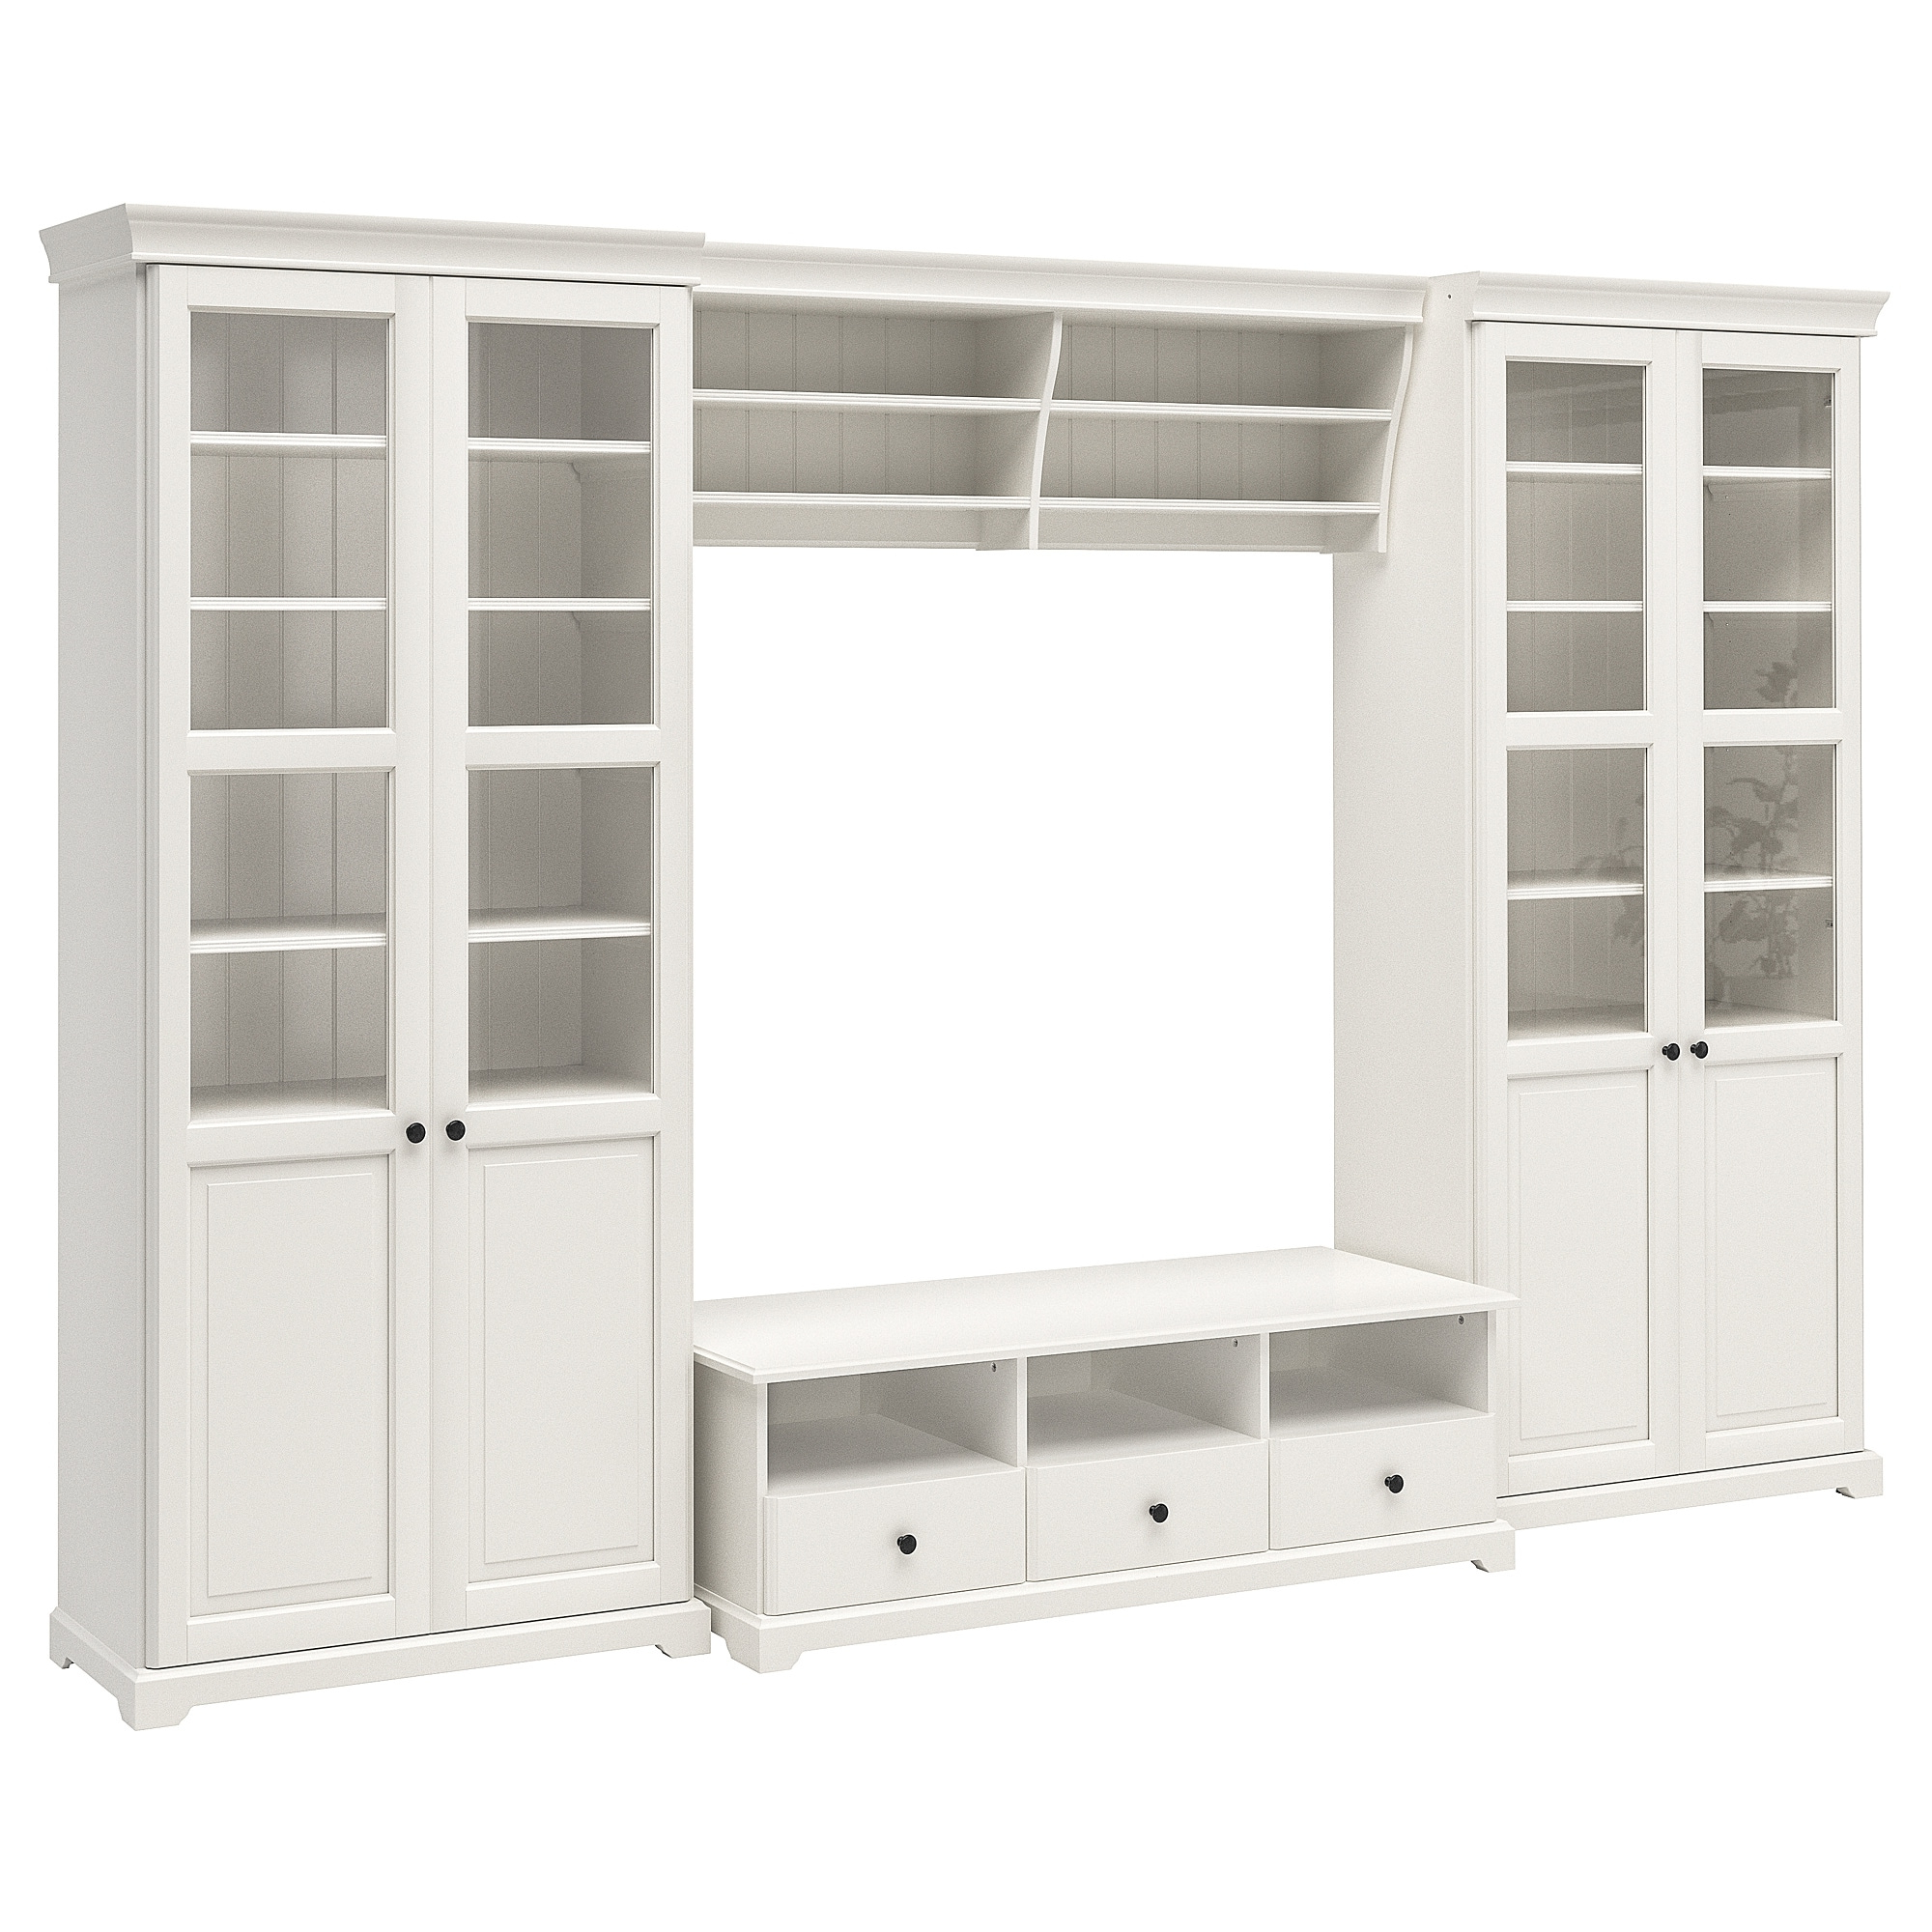 Muebles De Almacenaje Txdf Liatorp Mueble Tv Con Almacenaje Blanco 332 X 214 Cm Ikea